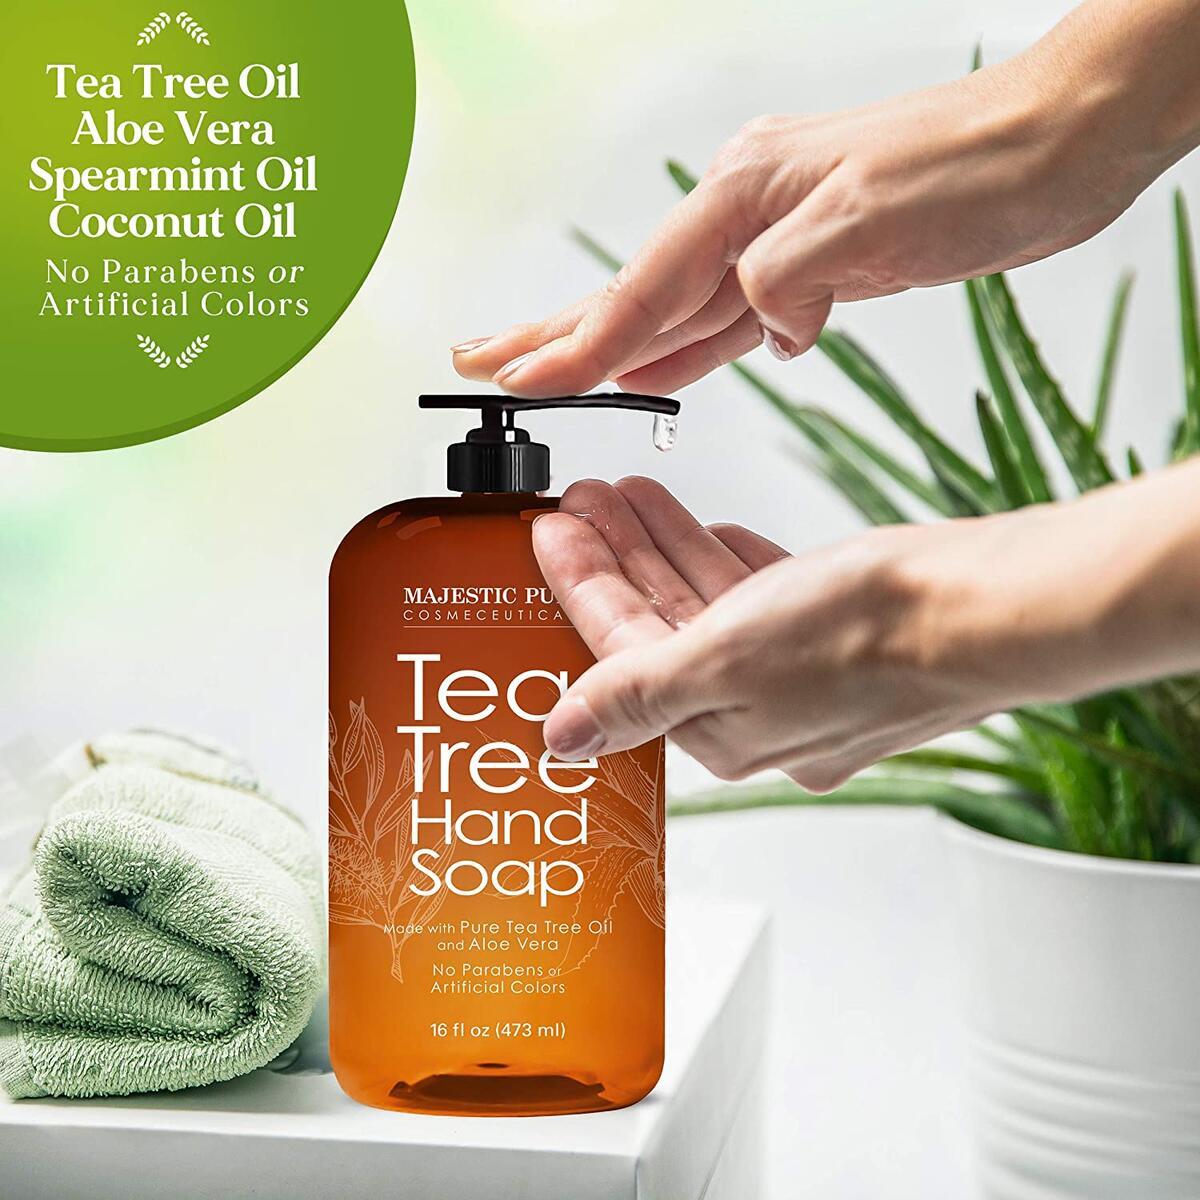 Tea Tree Hand Soap - Liquid Hand Wash with Pure Aloe Vera, Rosemary & Spearmint - Hand Wash with Pump - Sulfate Free Formula -16 fl oz